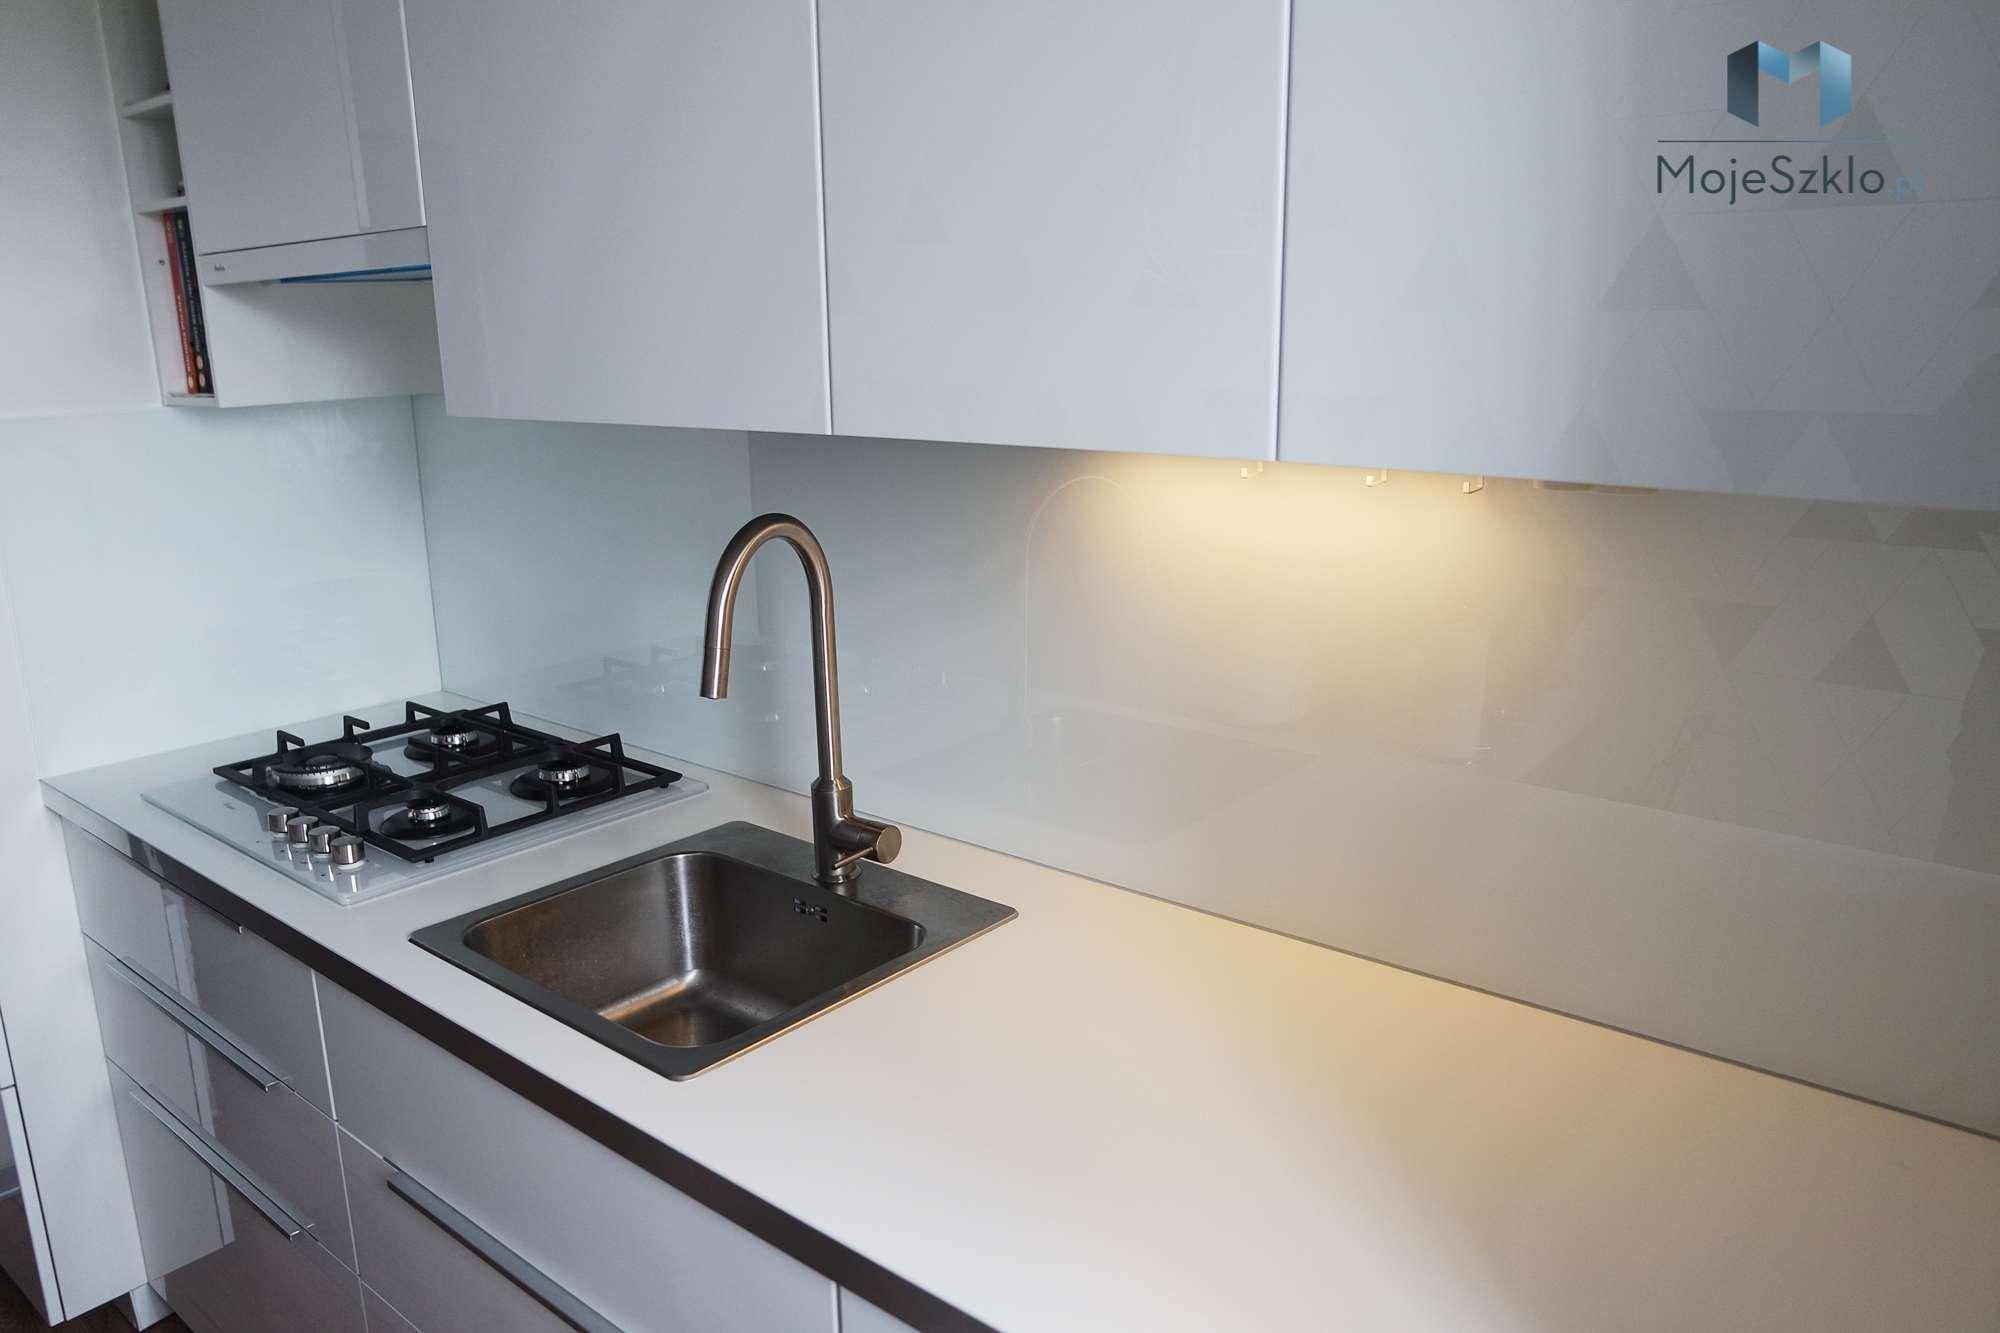 Lacobel Bialy 9003 Krakow - Lustro w kuchni. Panele lustrzane do kuchni